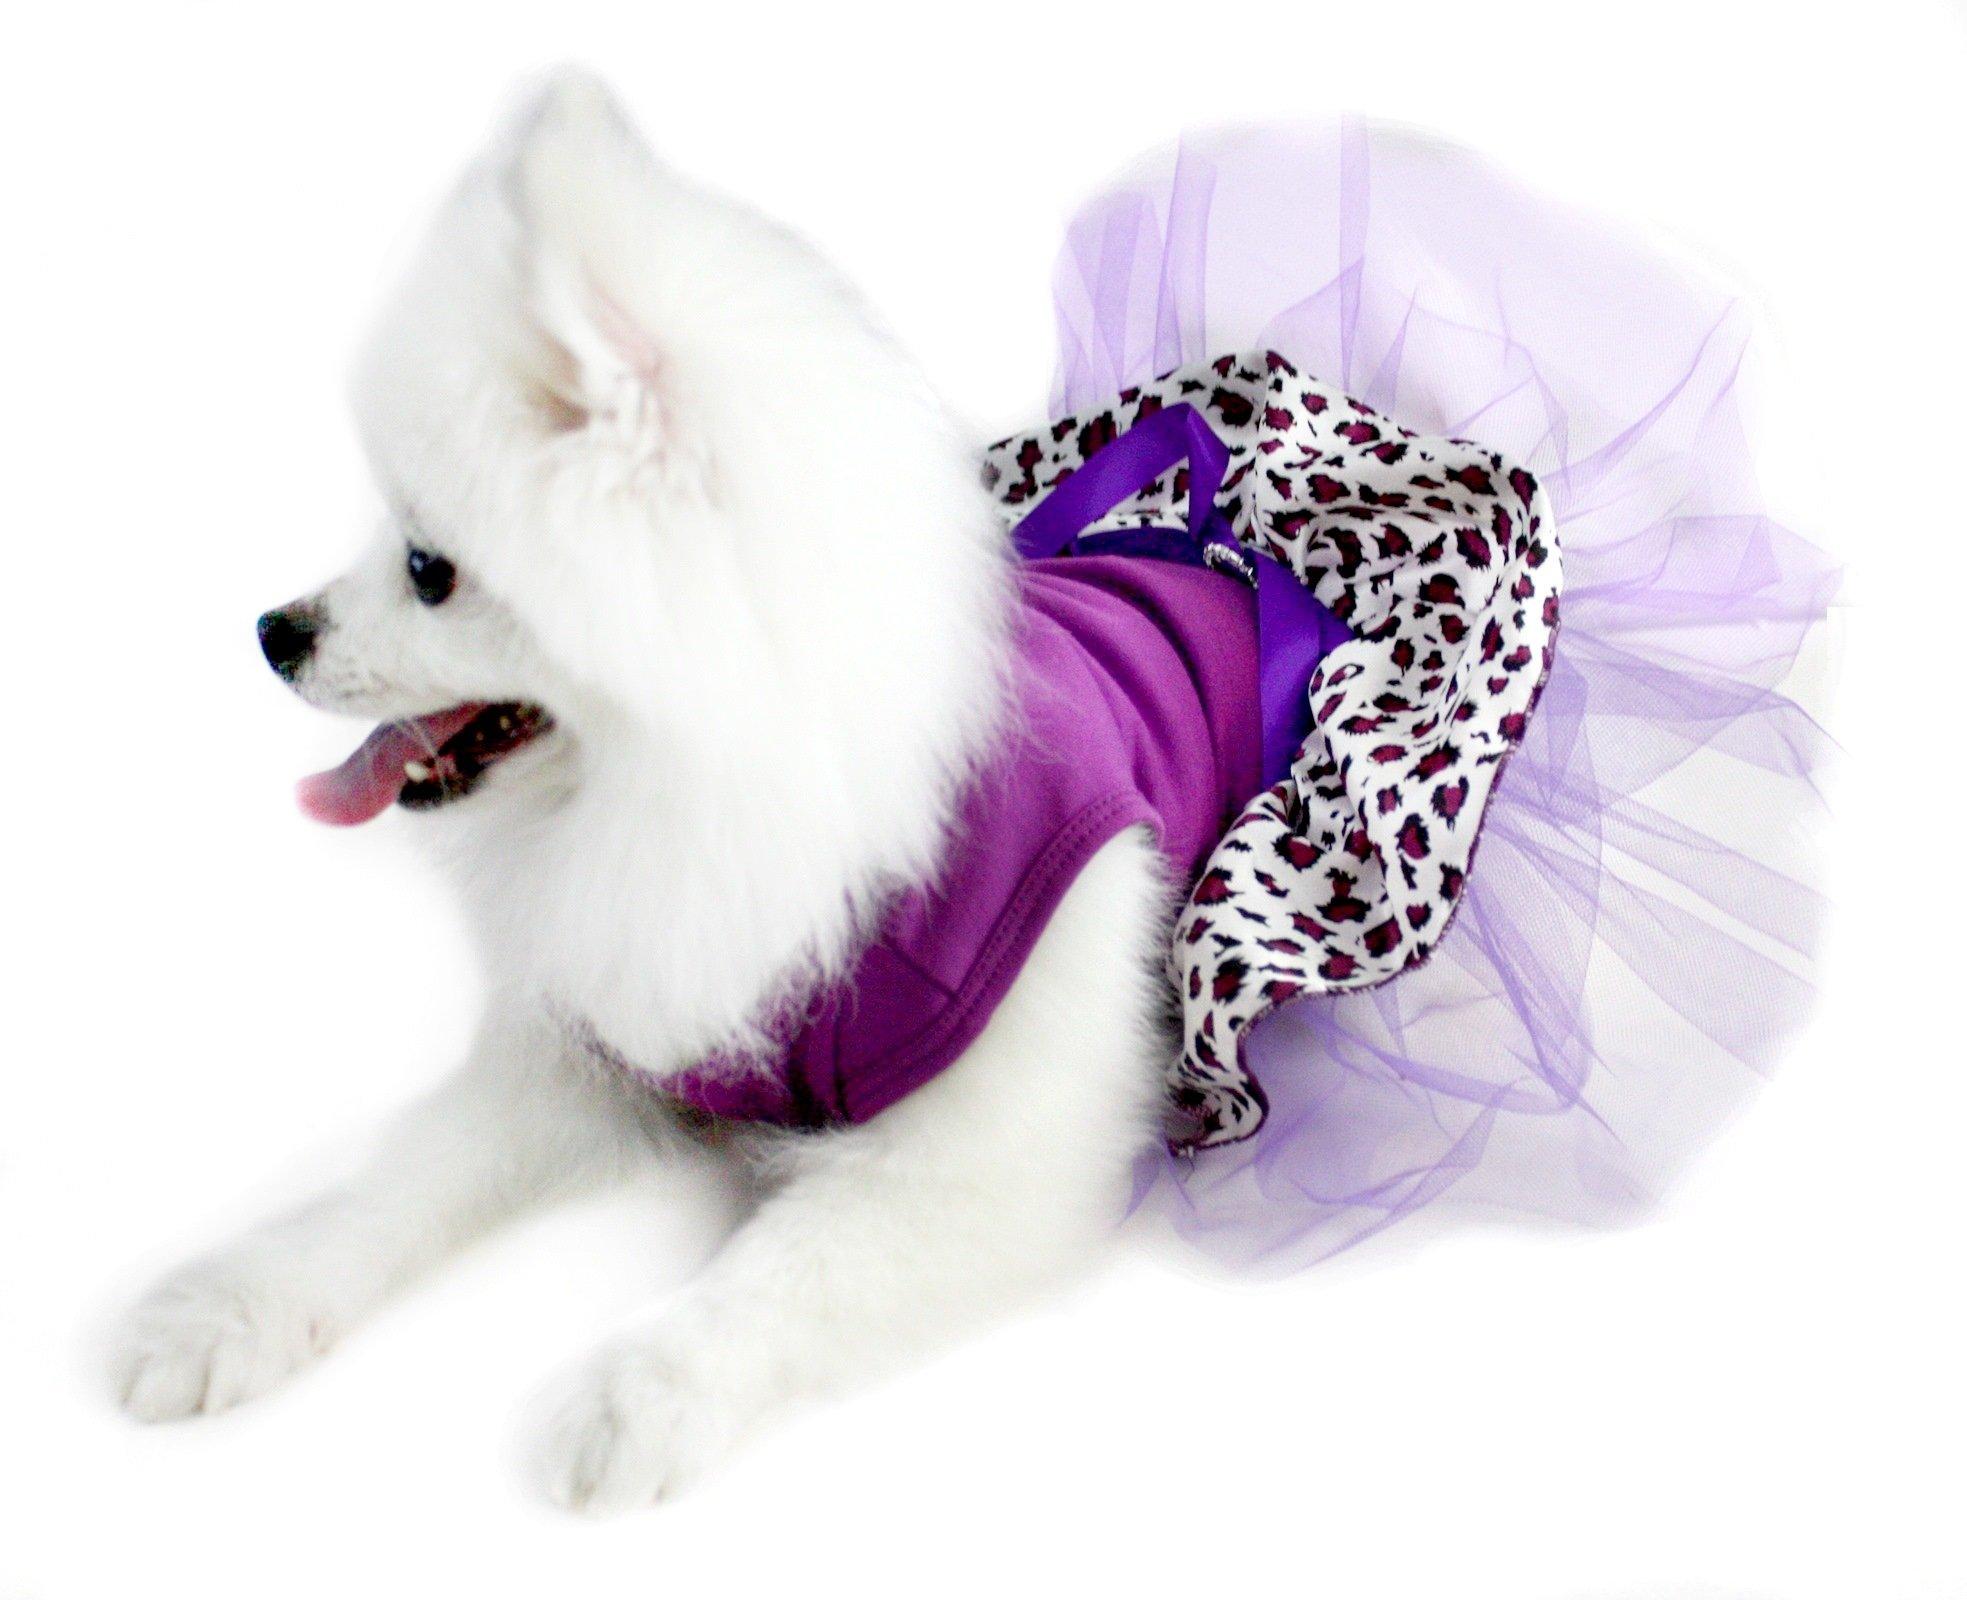 Puppy Clothes Dog Dress Grape Purple Cotton Top Leopard Tutu Animal Wear (Small)